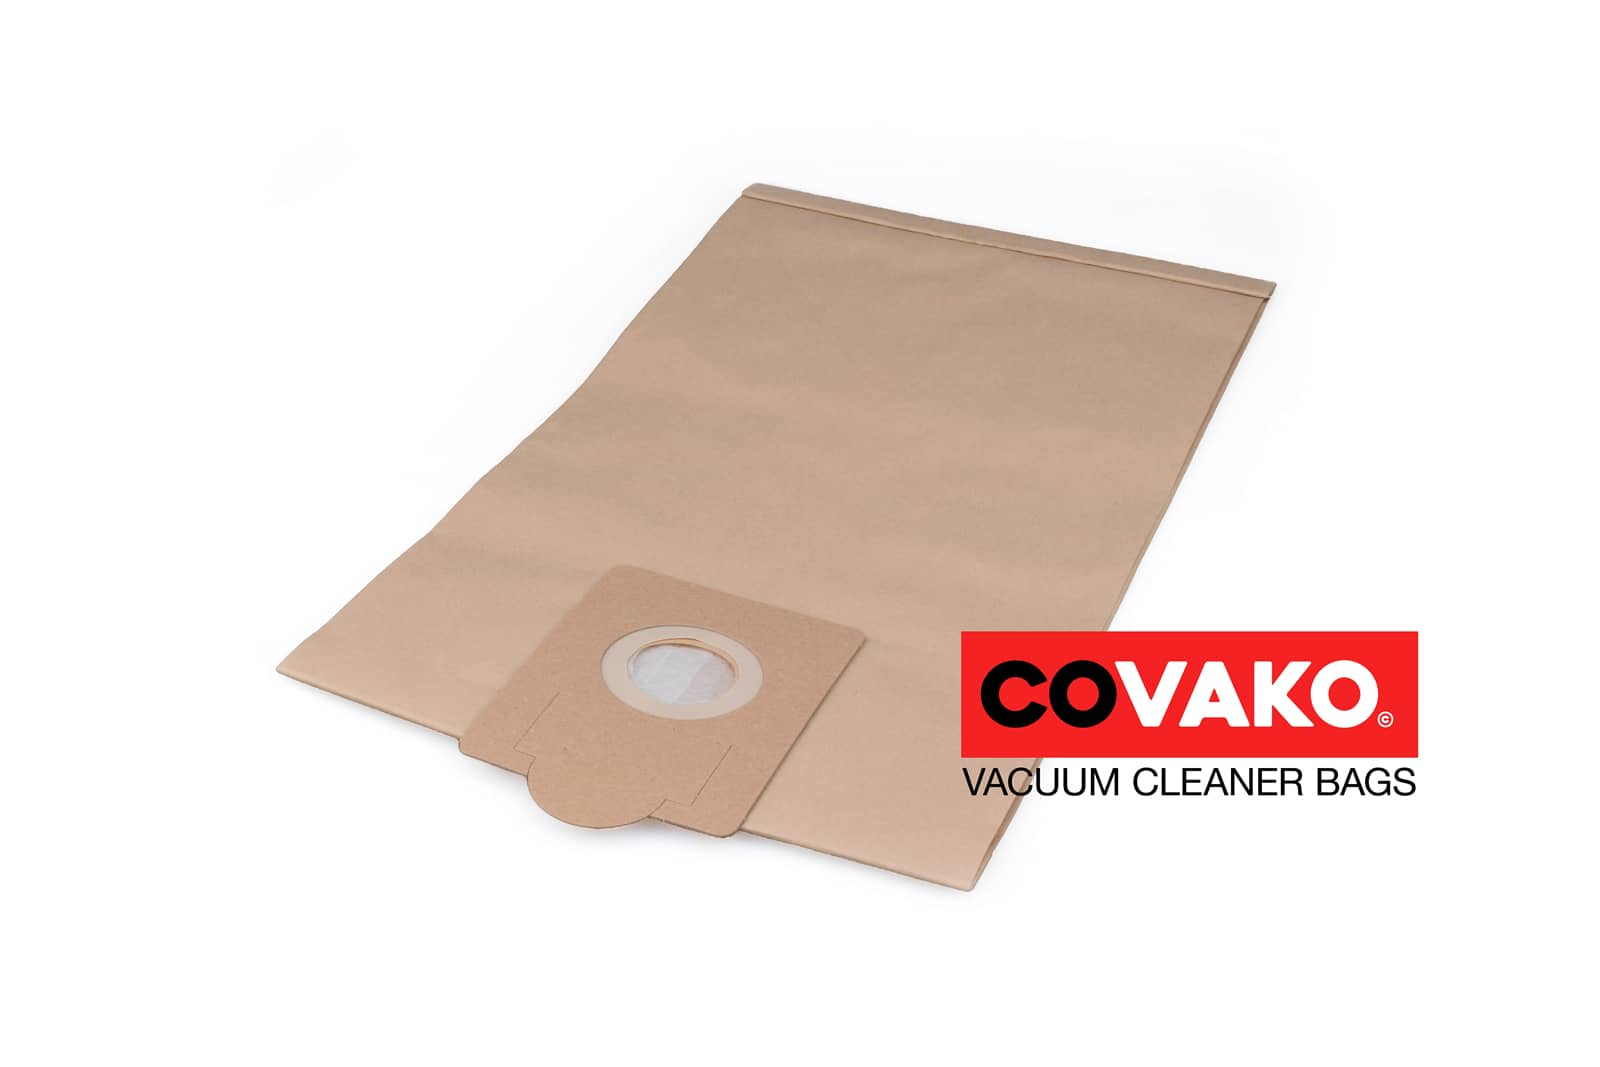 Hevo HW 251 / Papier - Hevo stofzuigerzakken